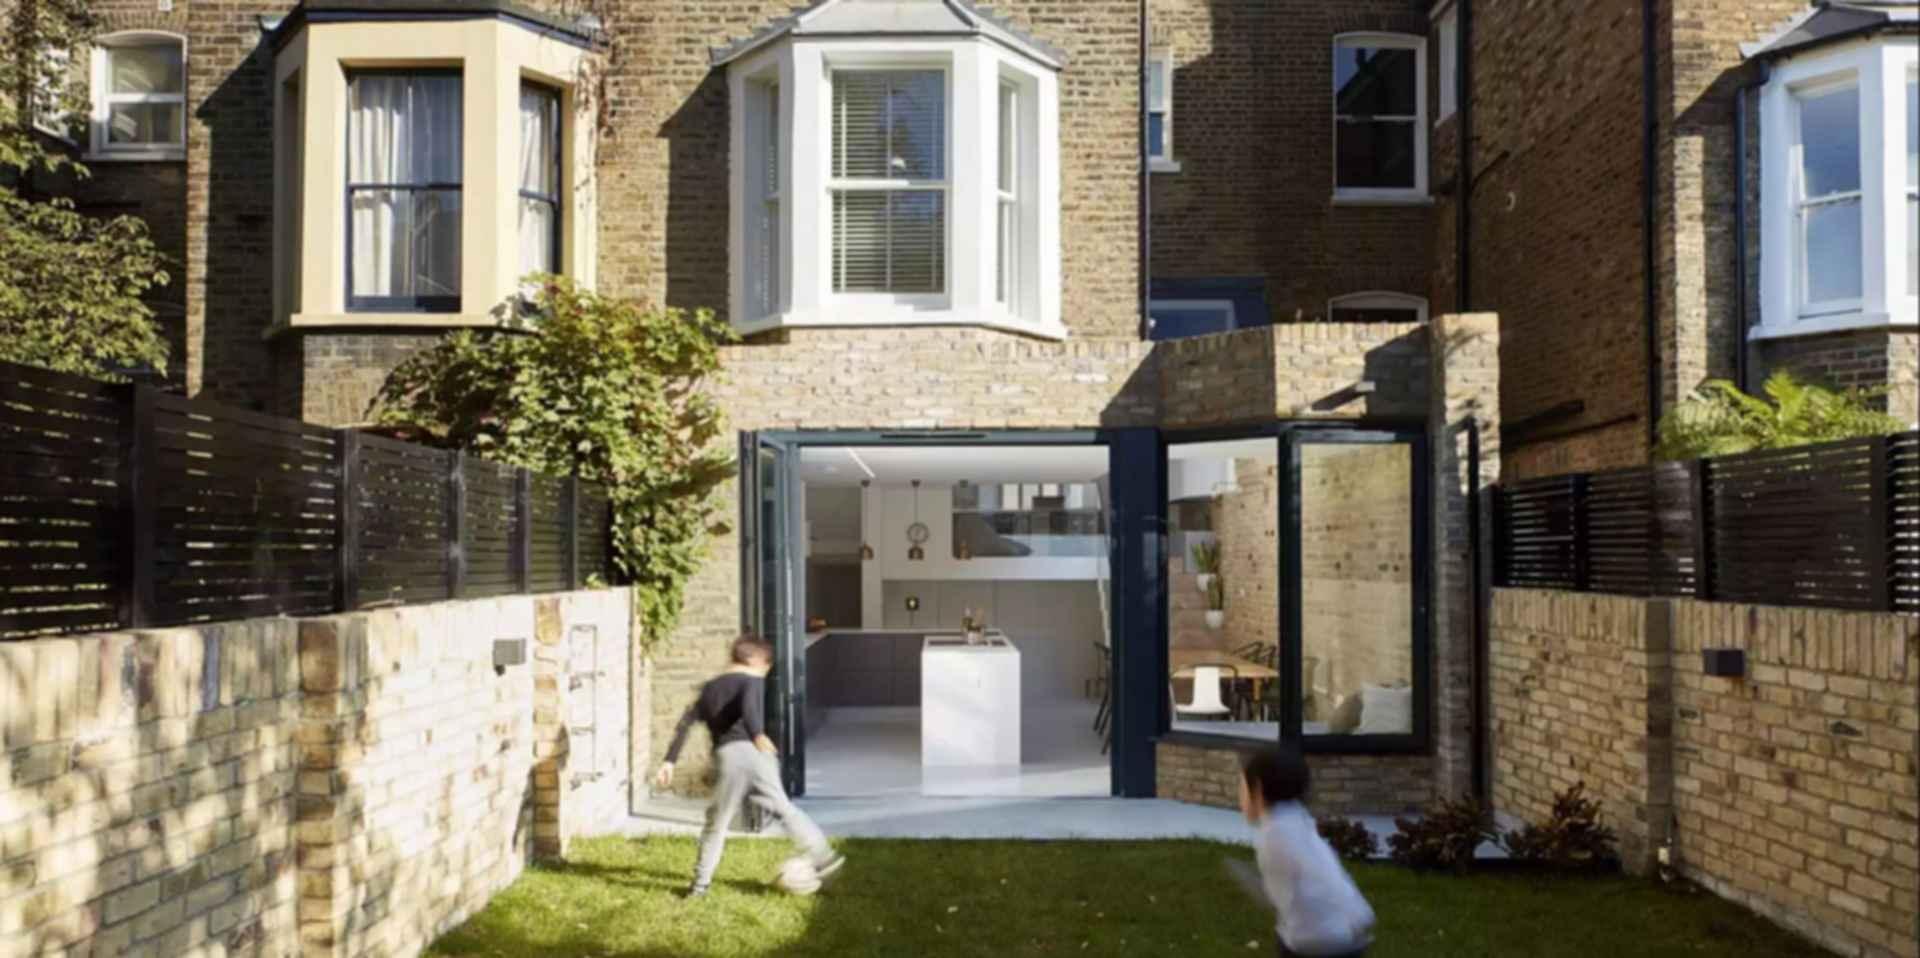 Scenario's House - Exterior/Outdoor Area